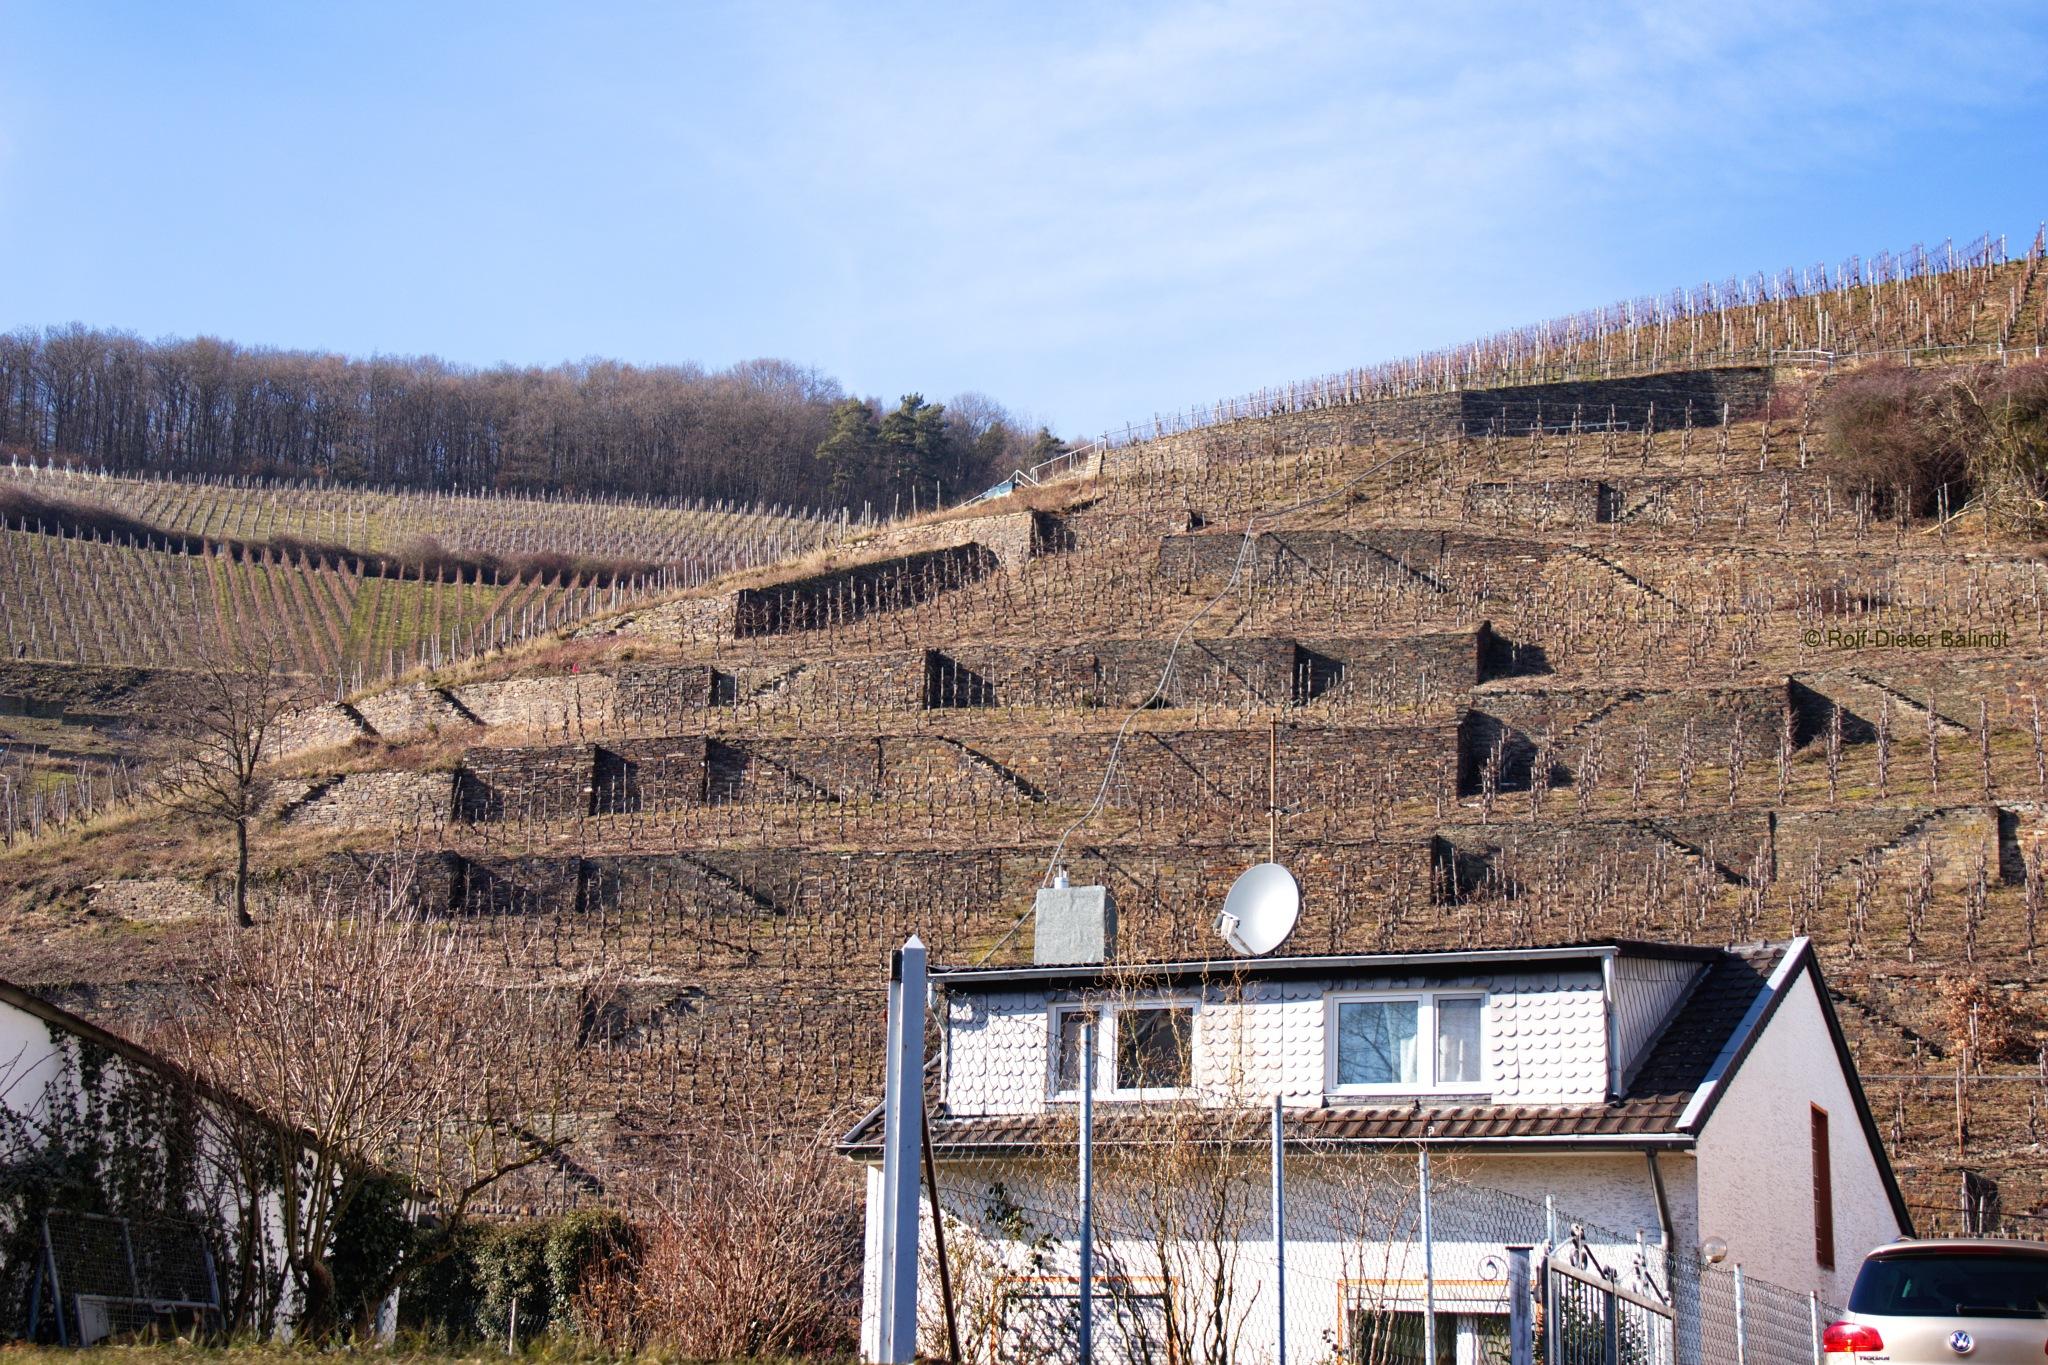 Ahrweiler by Rolf-Dieter Balindt